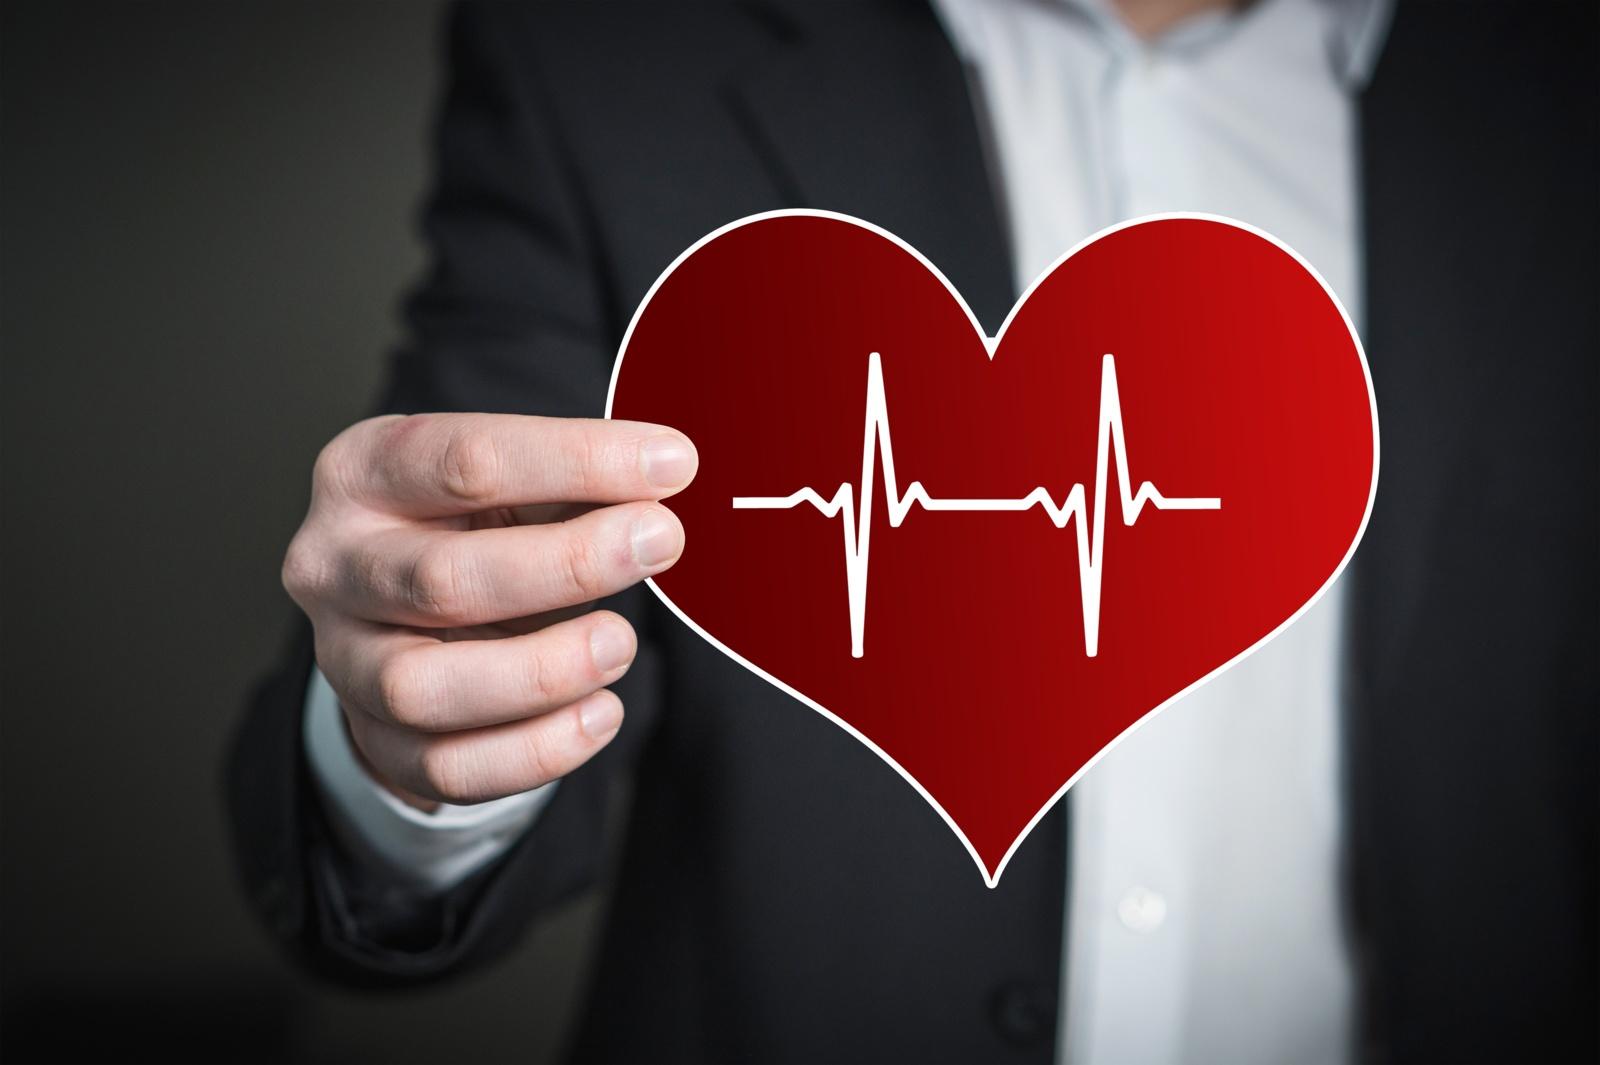 kada pradėti gydyti hipertenziją